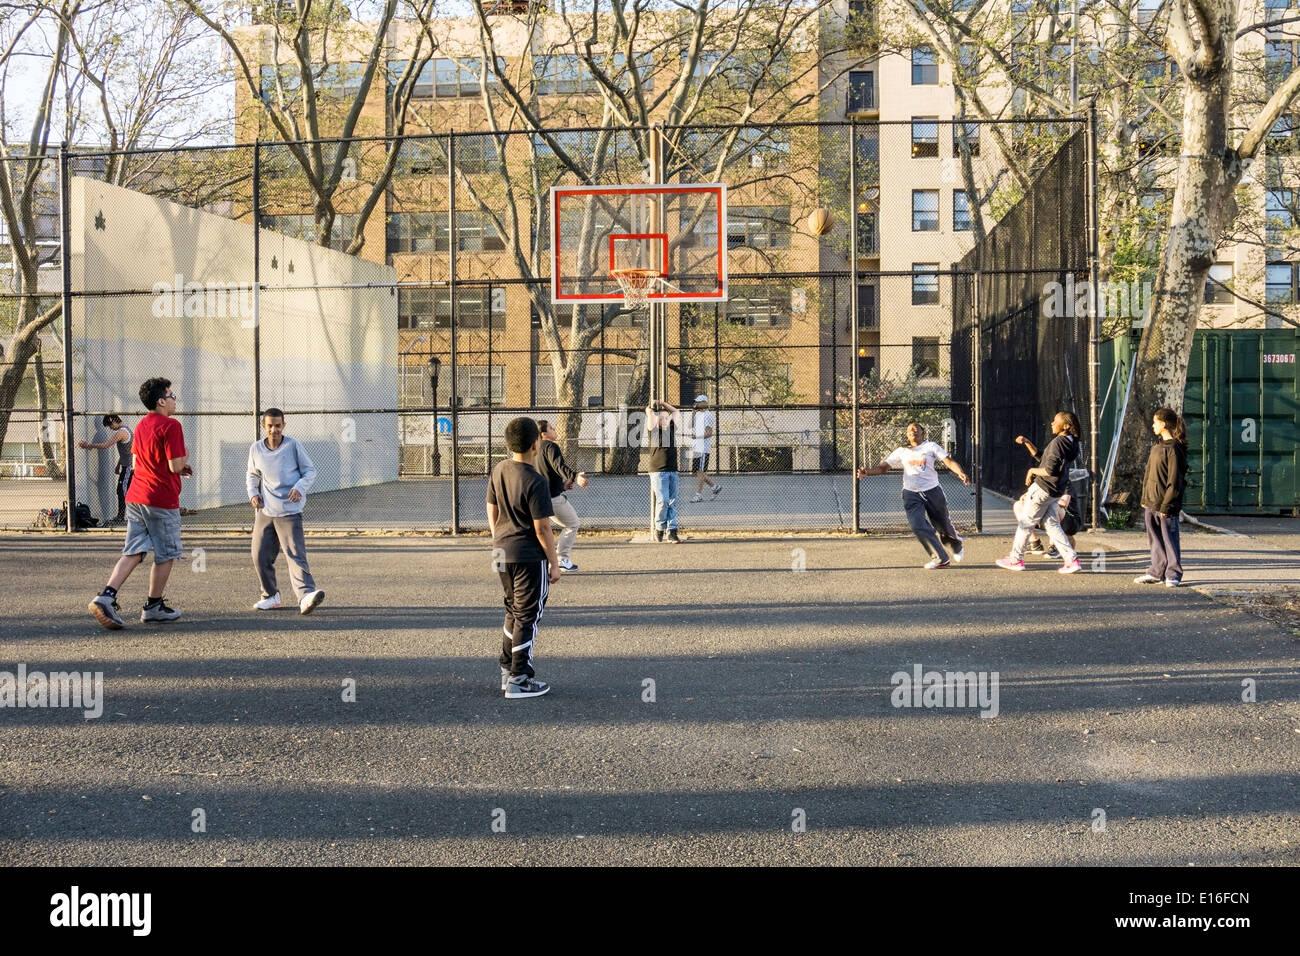 Teen chica negra busca la cesta en un afable unisex street juego de baloncesto en DeWitt Clinton park Hells Kitchen Imagen De Stock